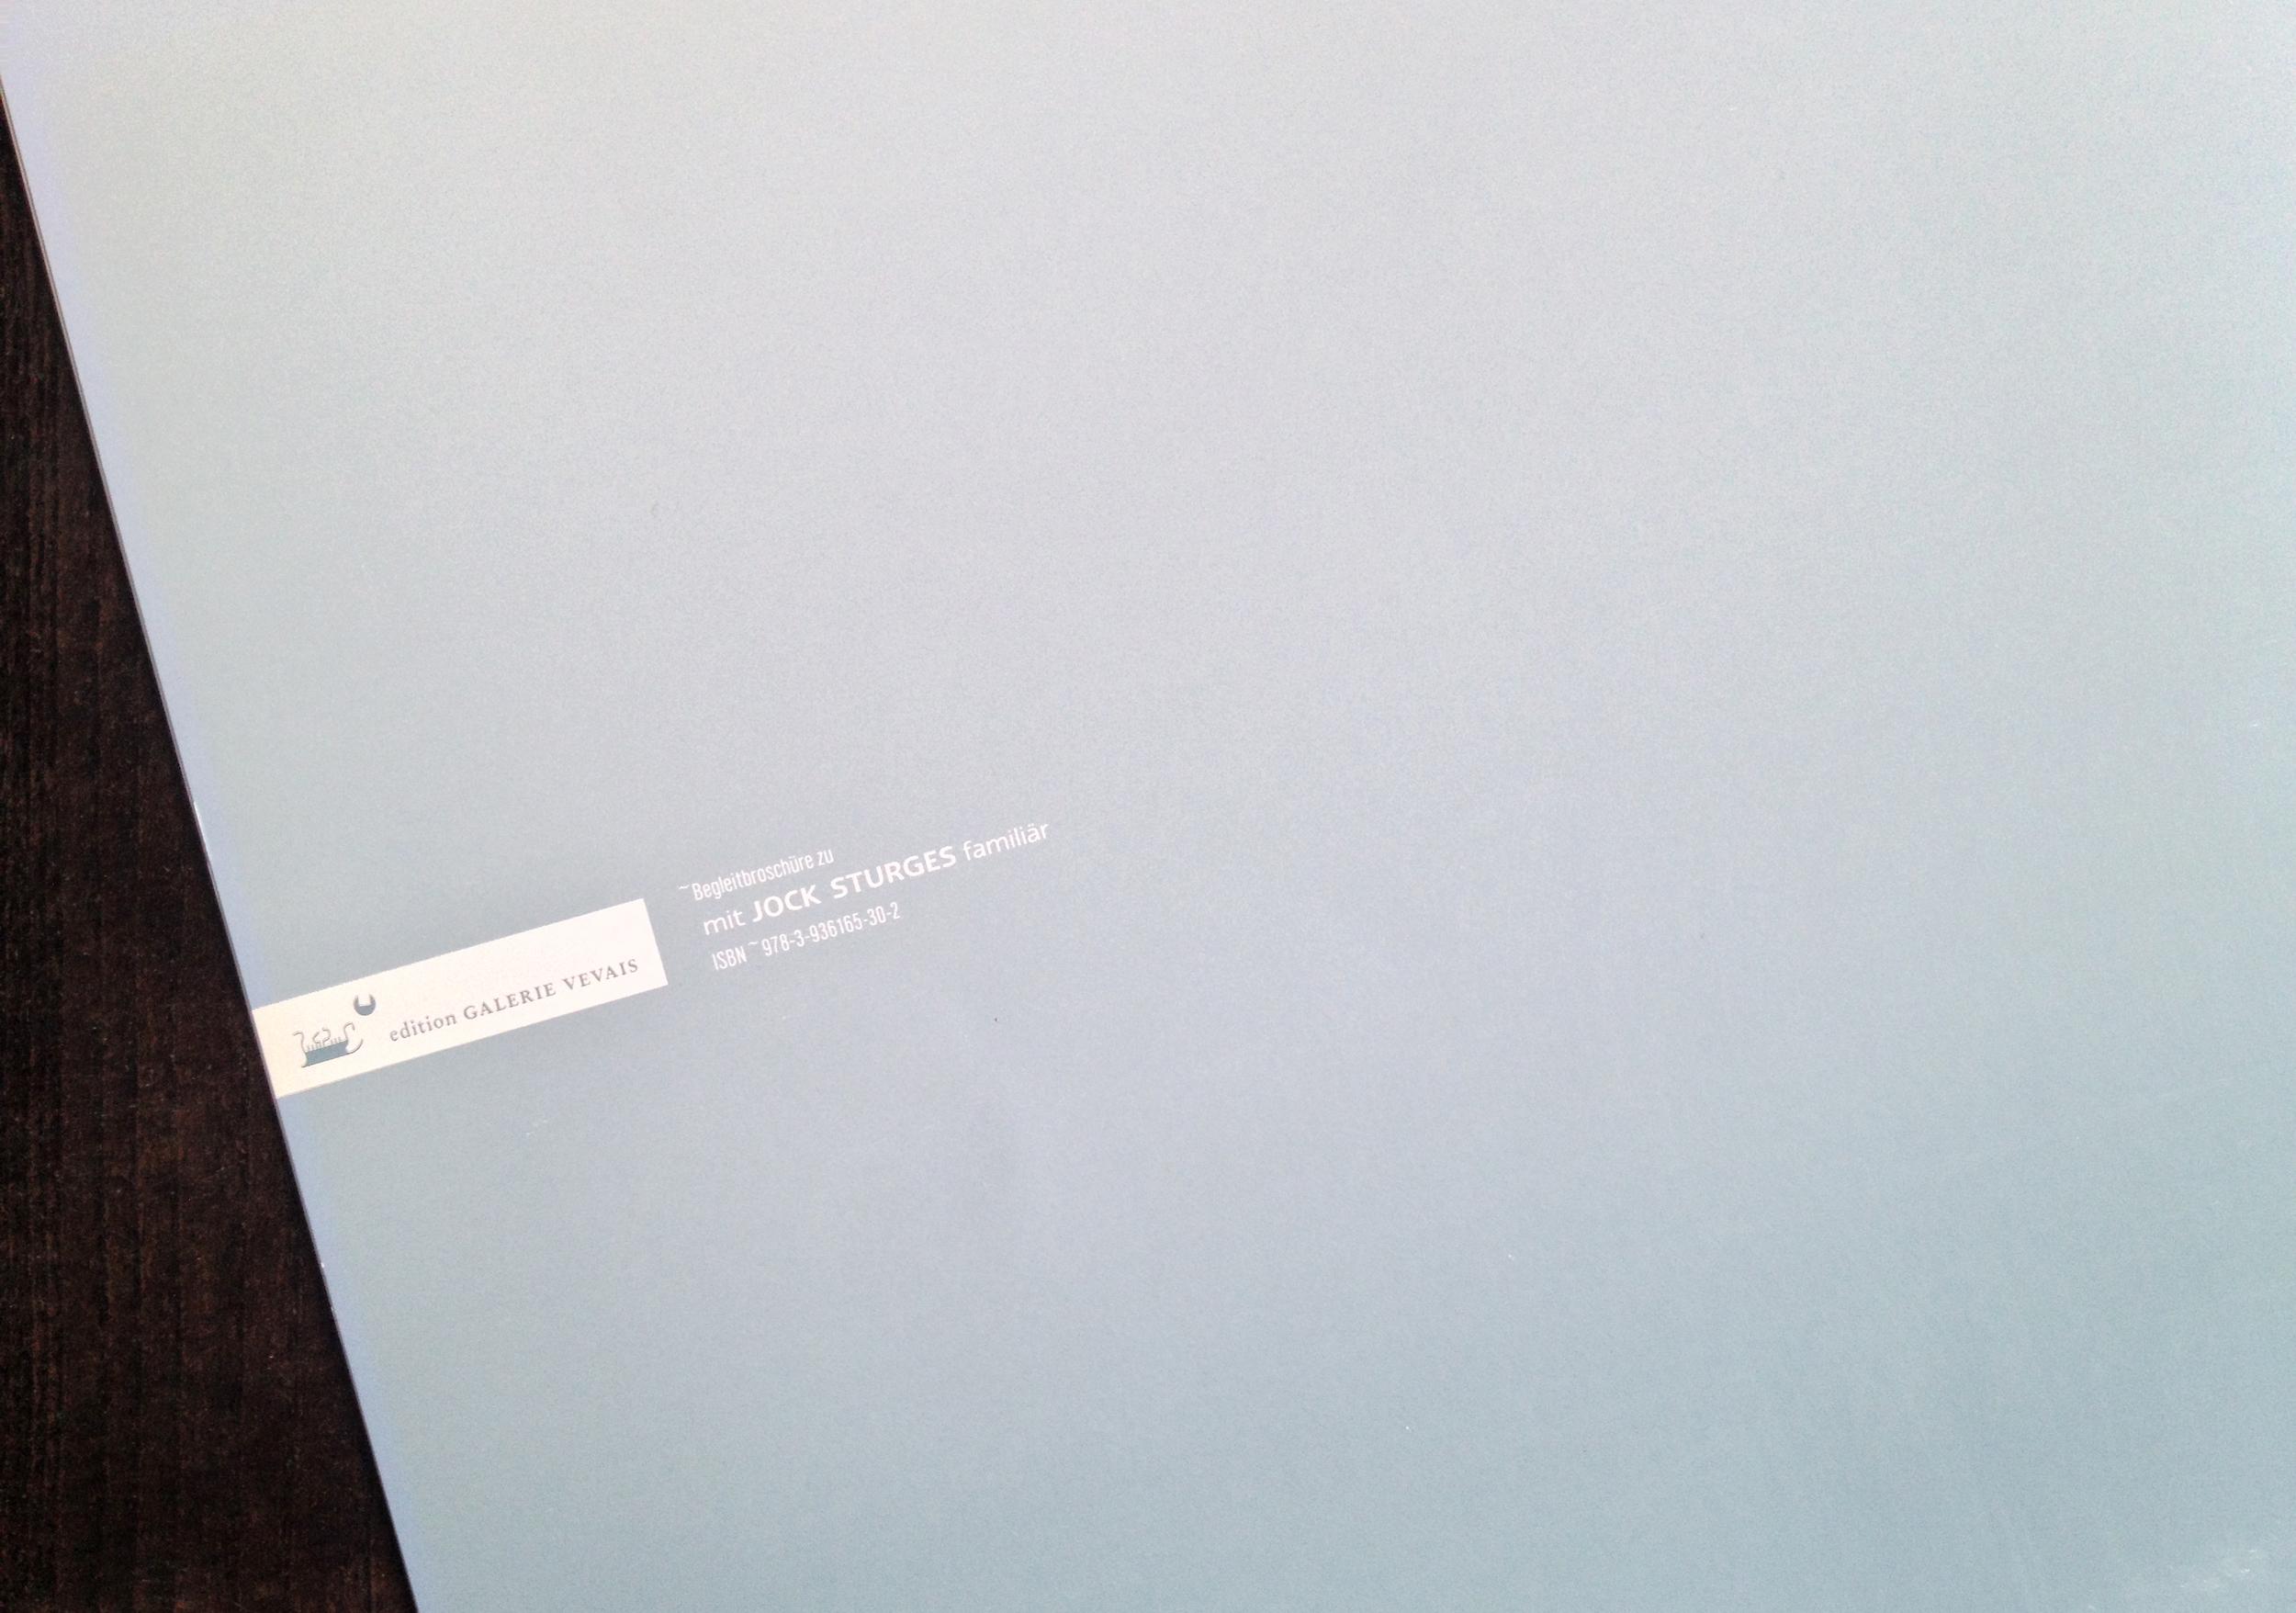 Mit-Jock-Sturges-familiaer-Booklet.jpg